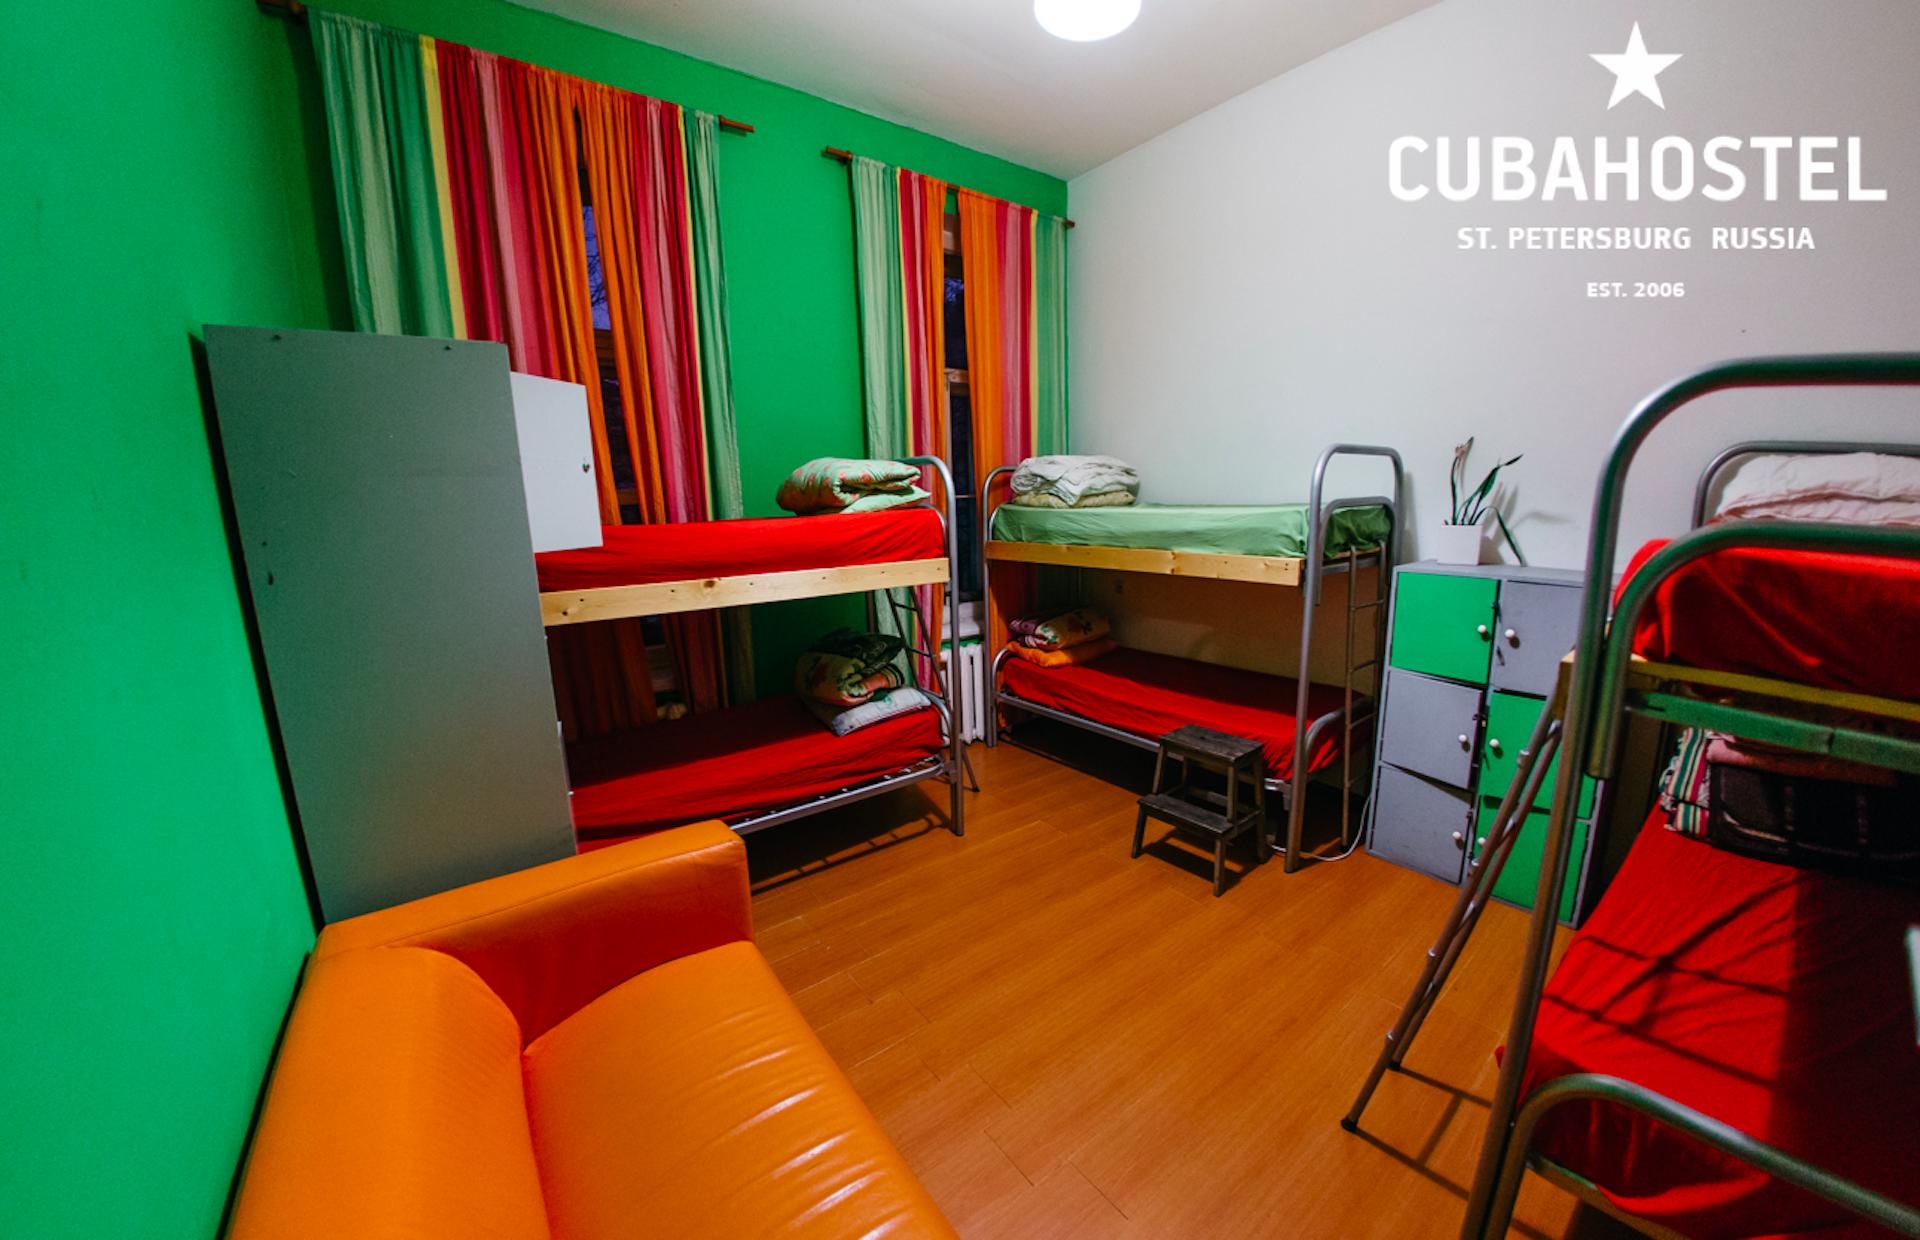 The Cuba Hostel